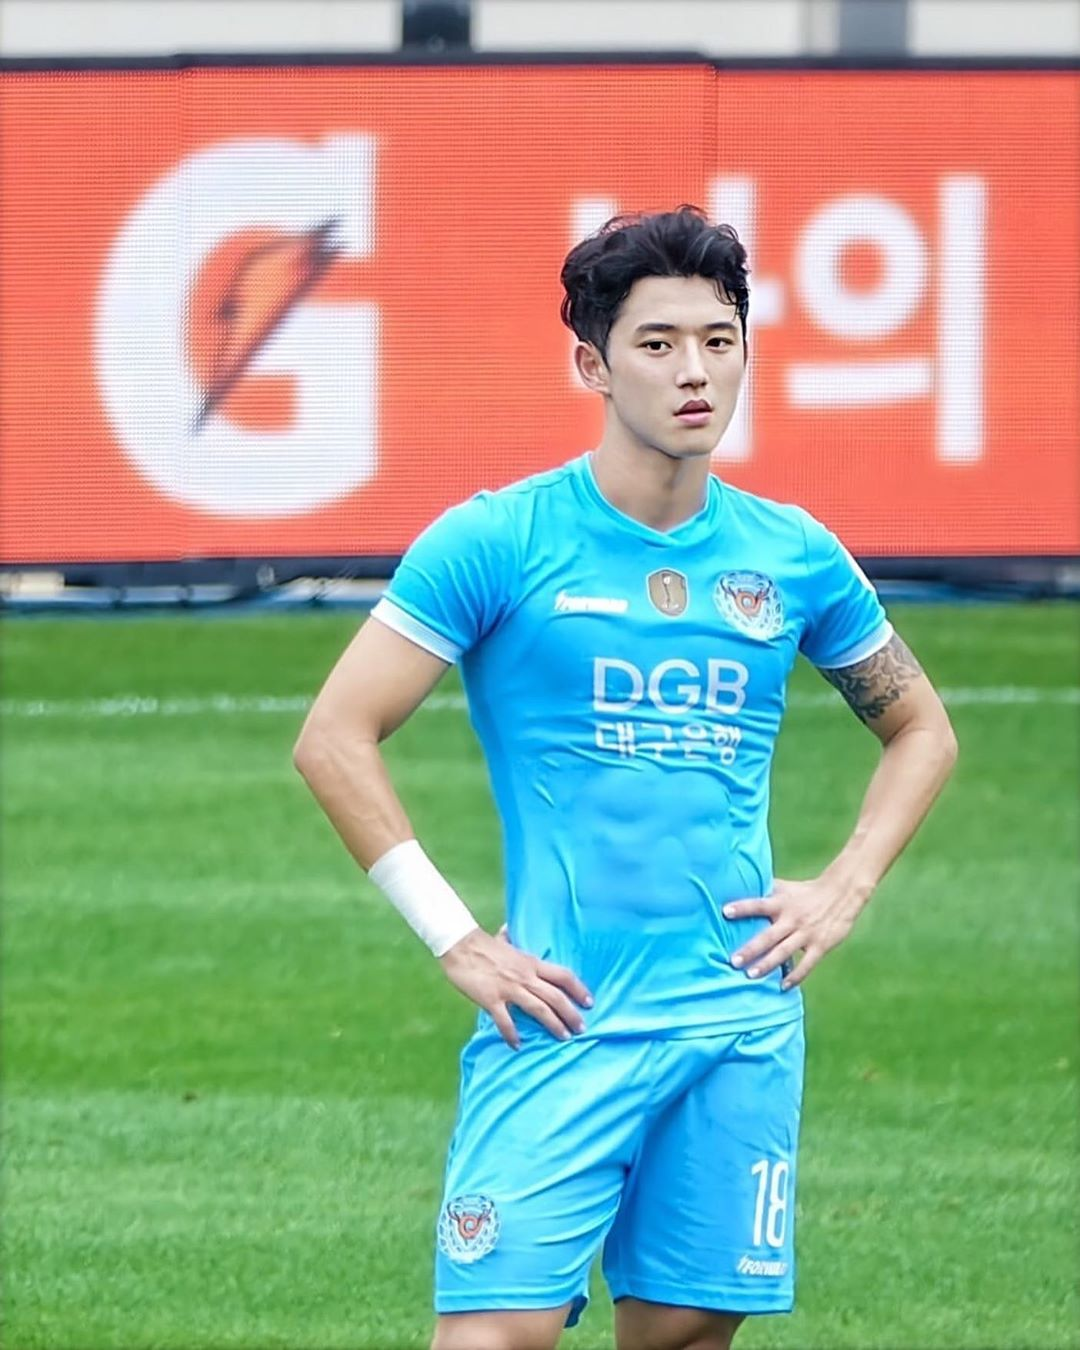 seungwon1